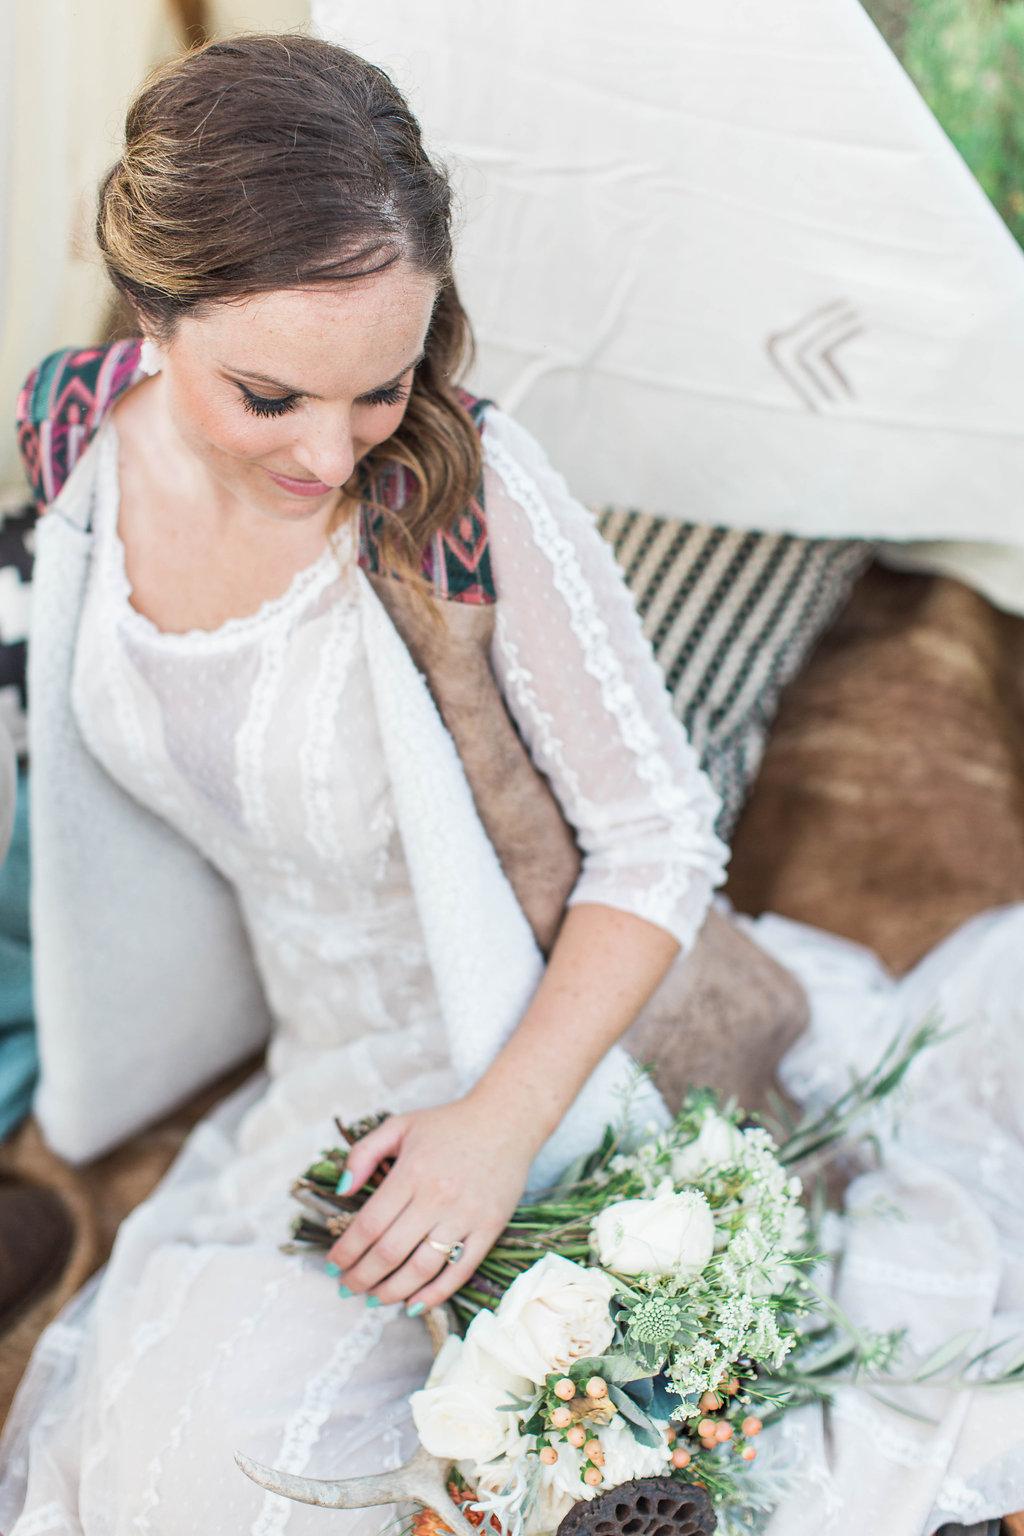 apt-b-photography-ivory-and-beau-bridal-boutique-anna-campbell-isobelle-australian-wedding-the-collins-quarter-savannah-wedding-savannah-weddings-savannah-florist-savannah-bridal-savannah-event-designer-savannah-wedding-dresses-outback-wedding-33.jpg